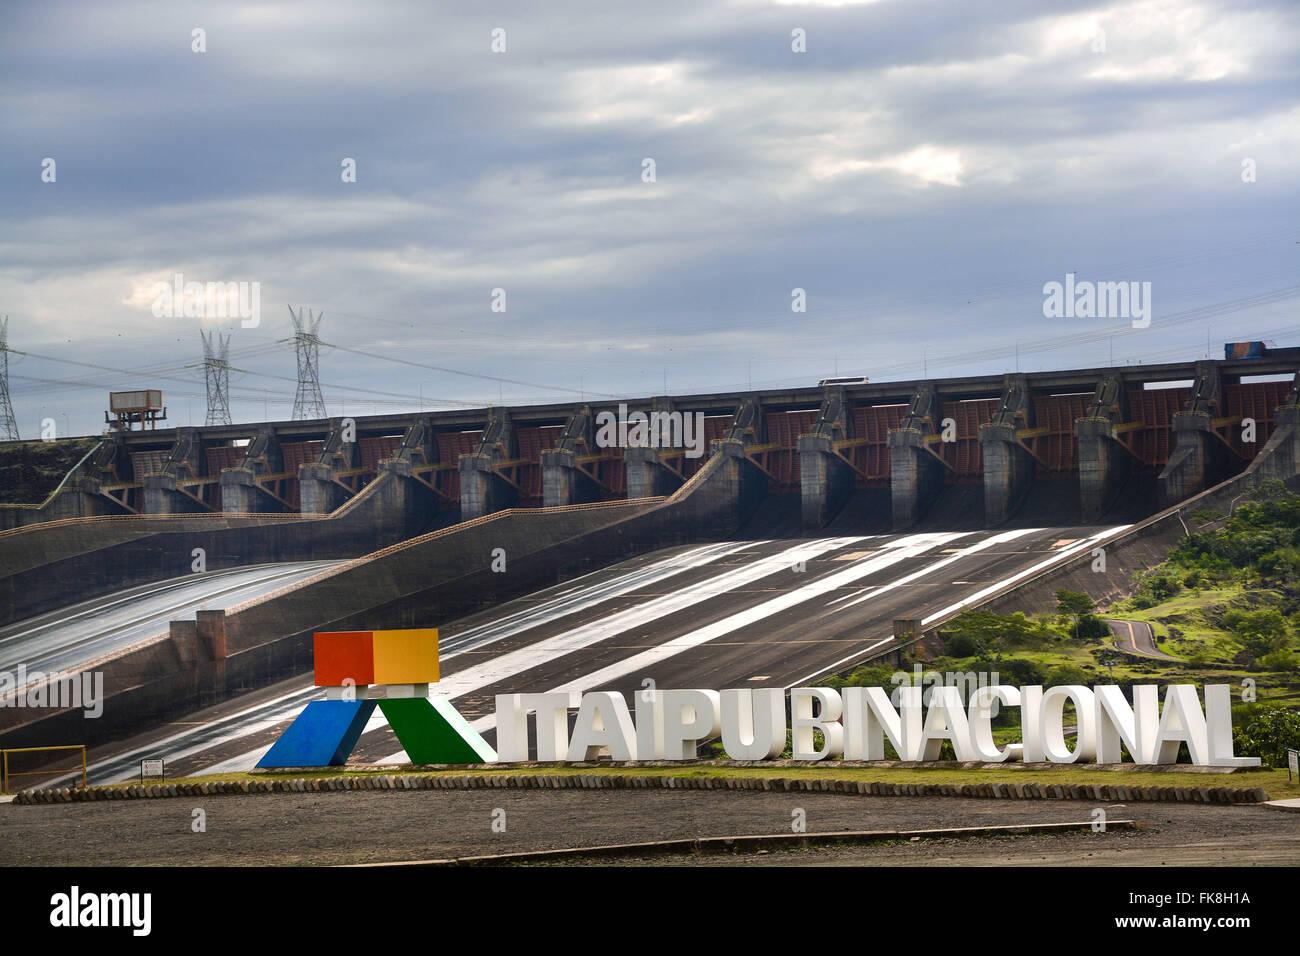 Spillway Itaipu dam - Itaipu - Integration between Brazil and Paraguay - Stock Image